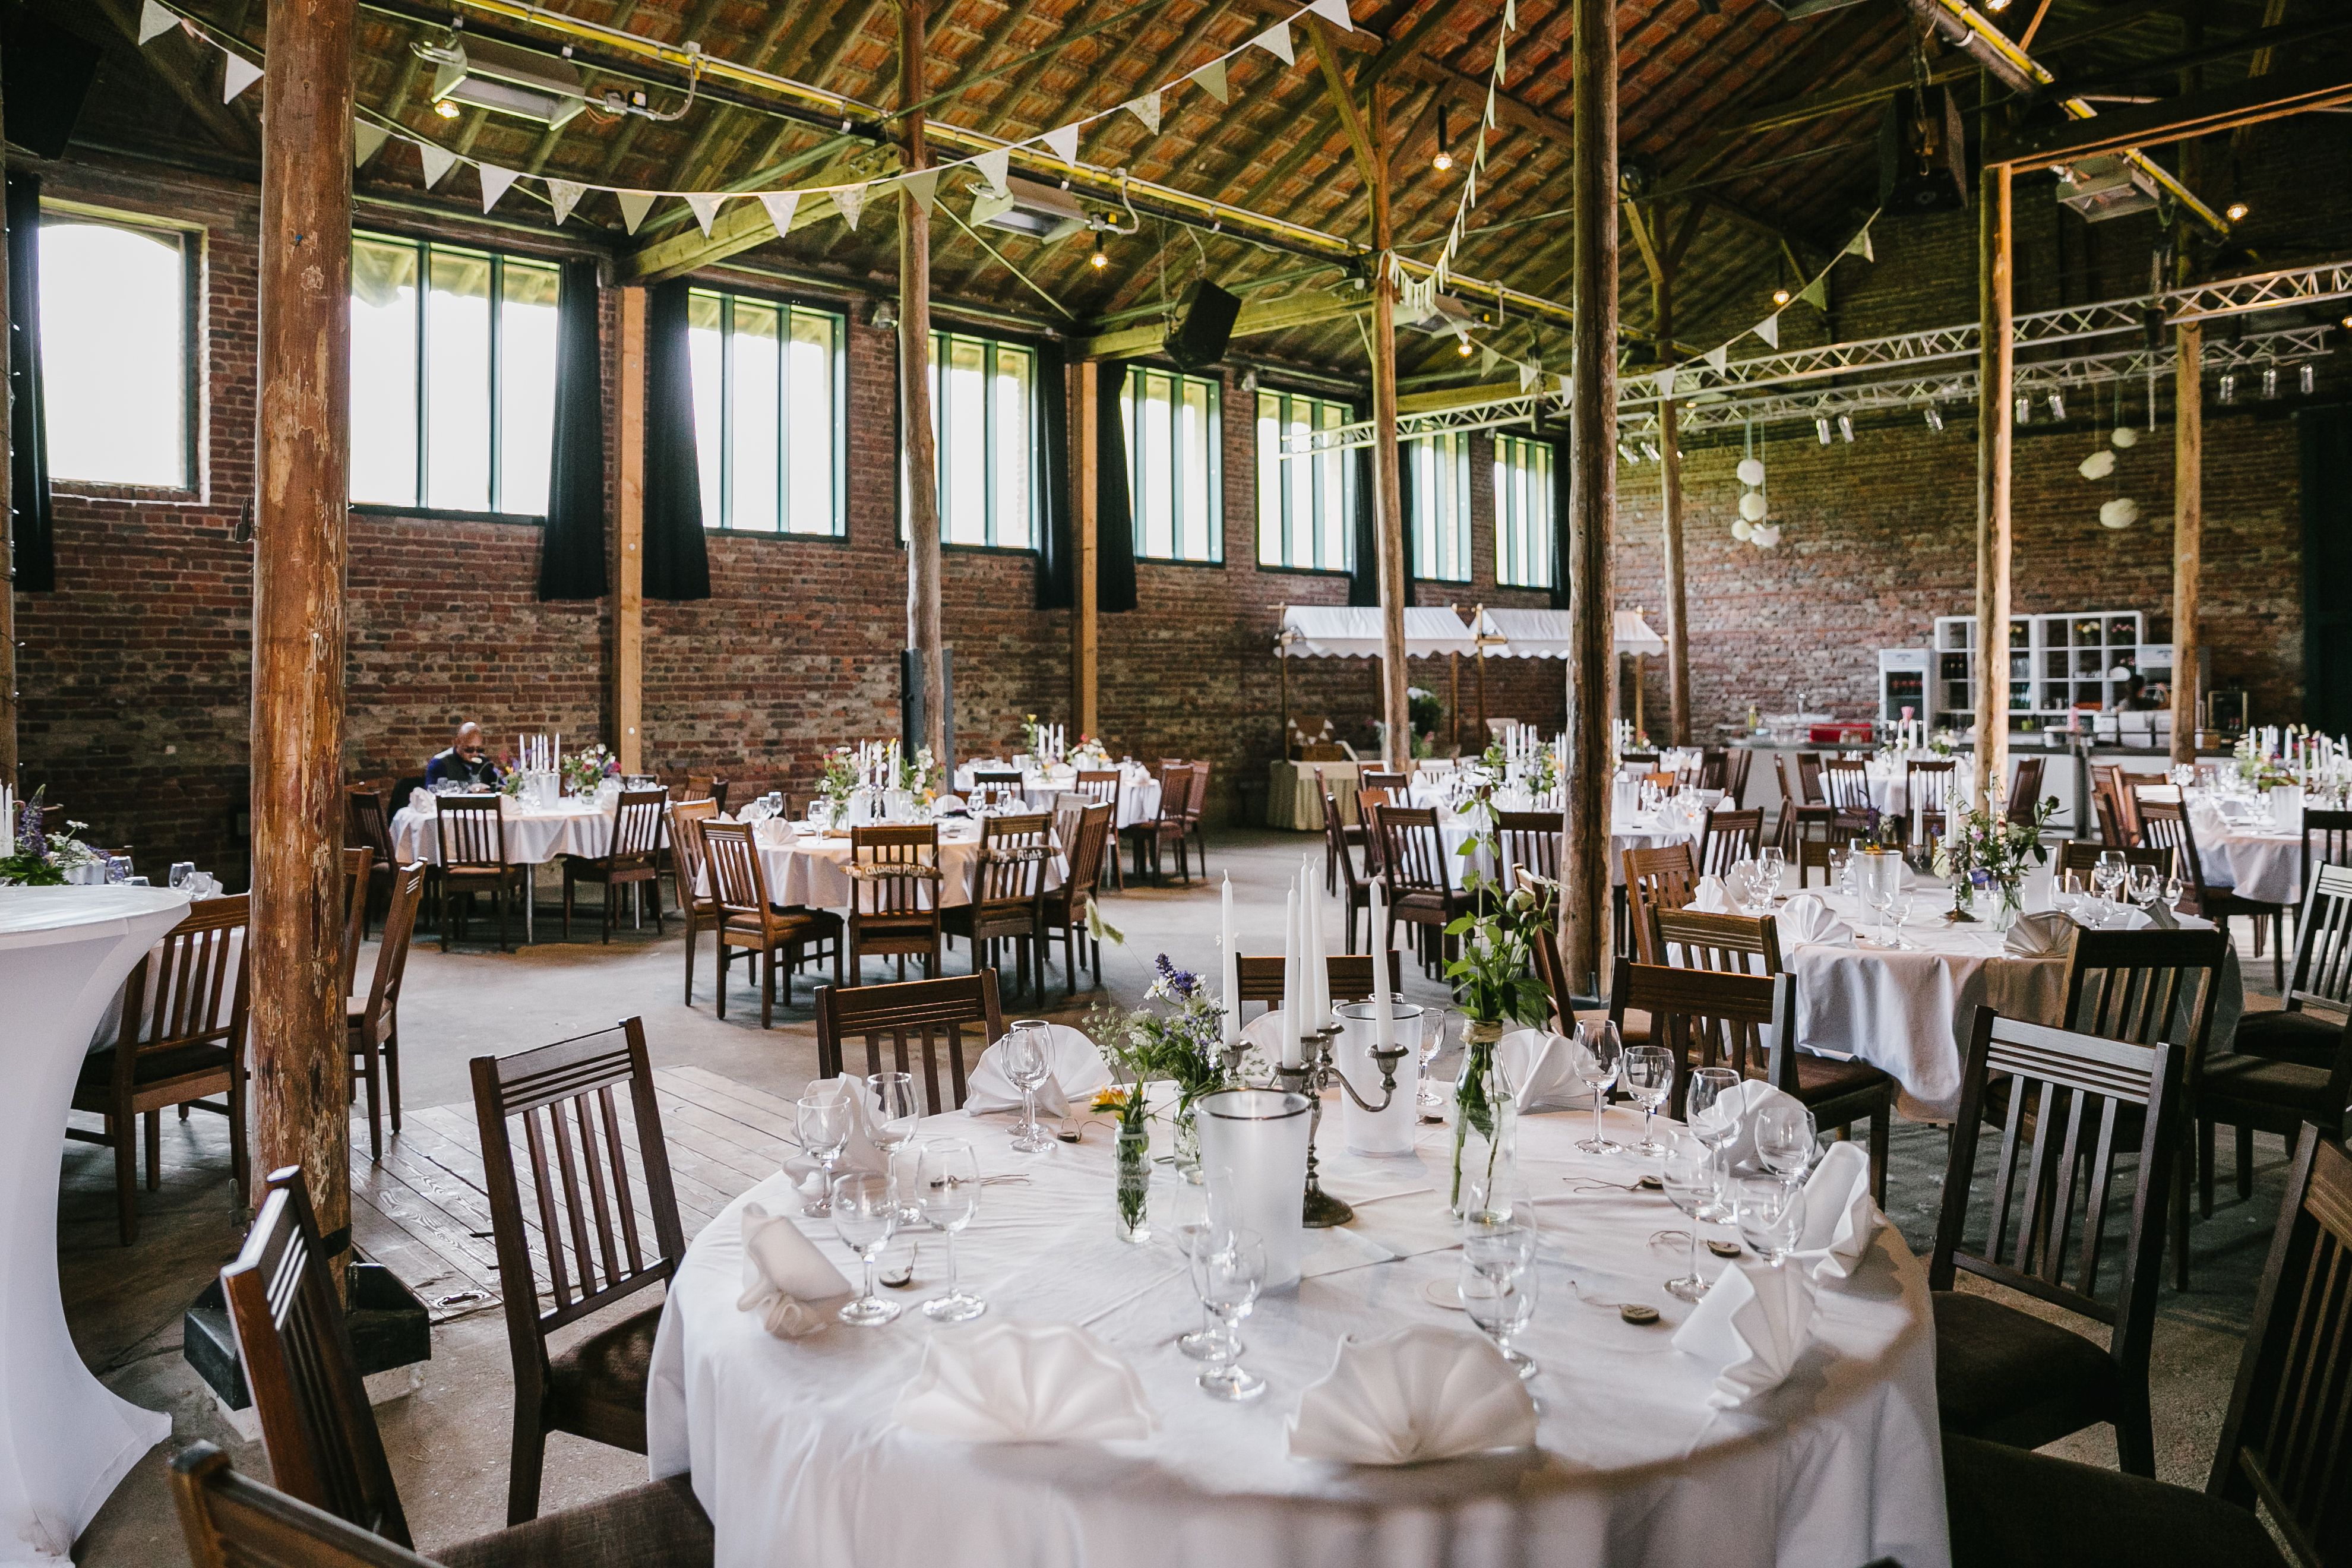 Schloss Rahe Hochzeiten Wedding locations Pinterest